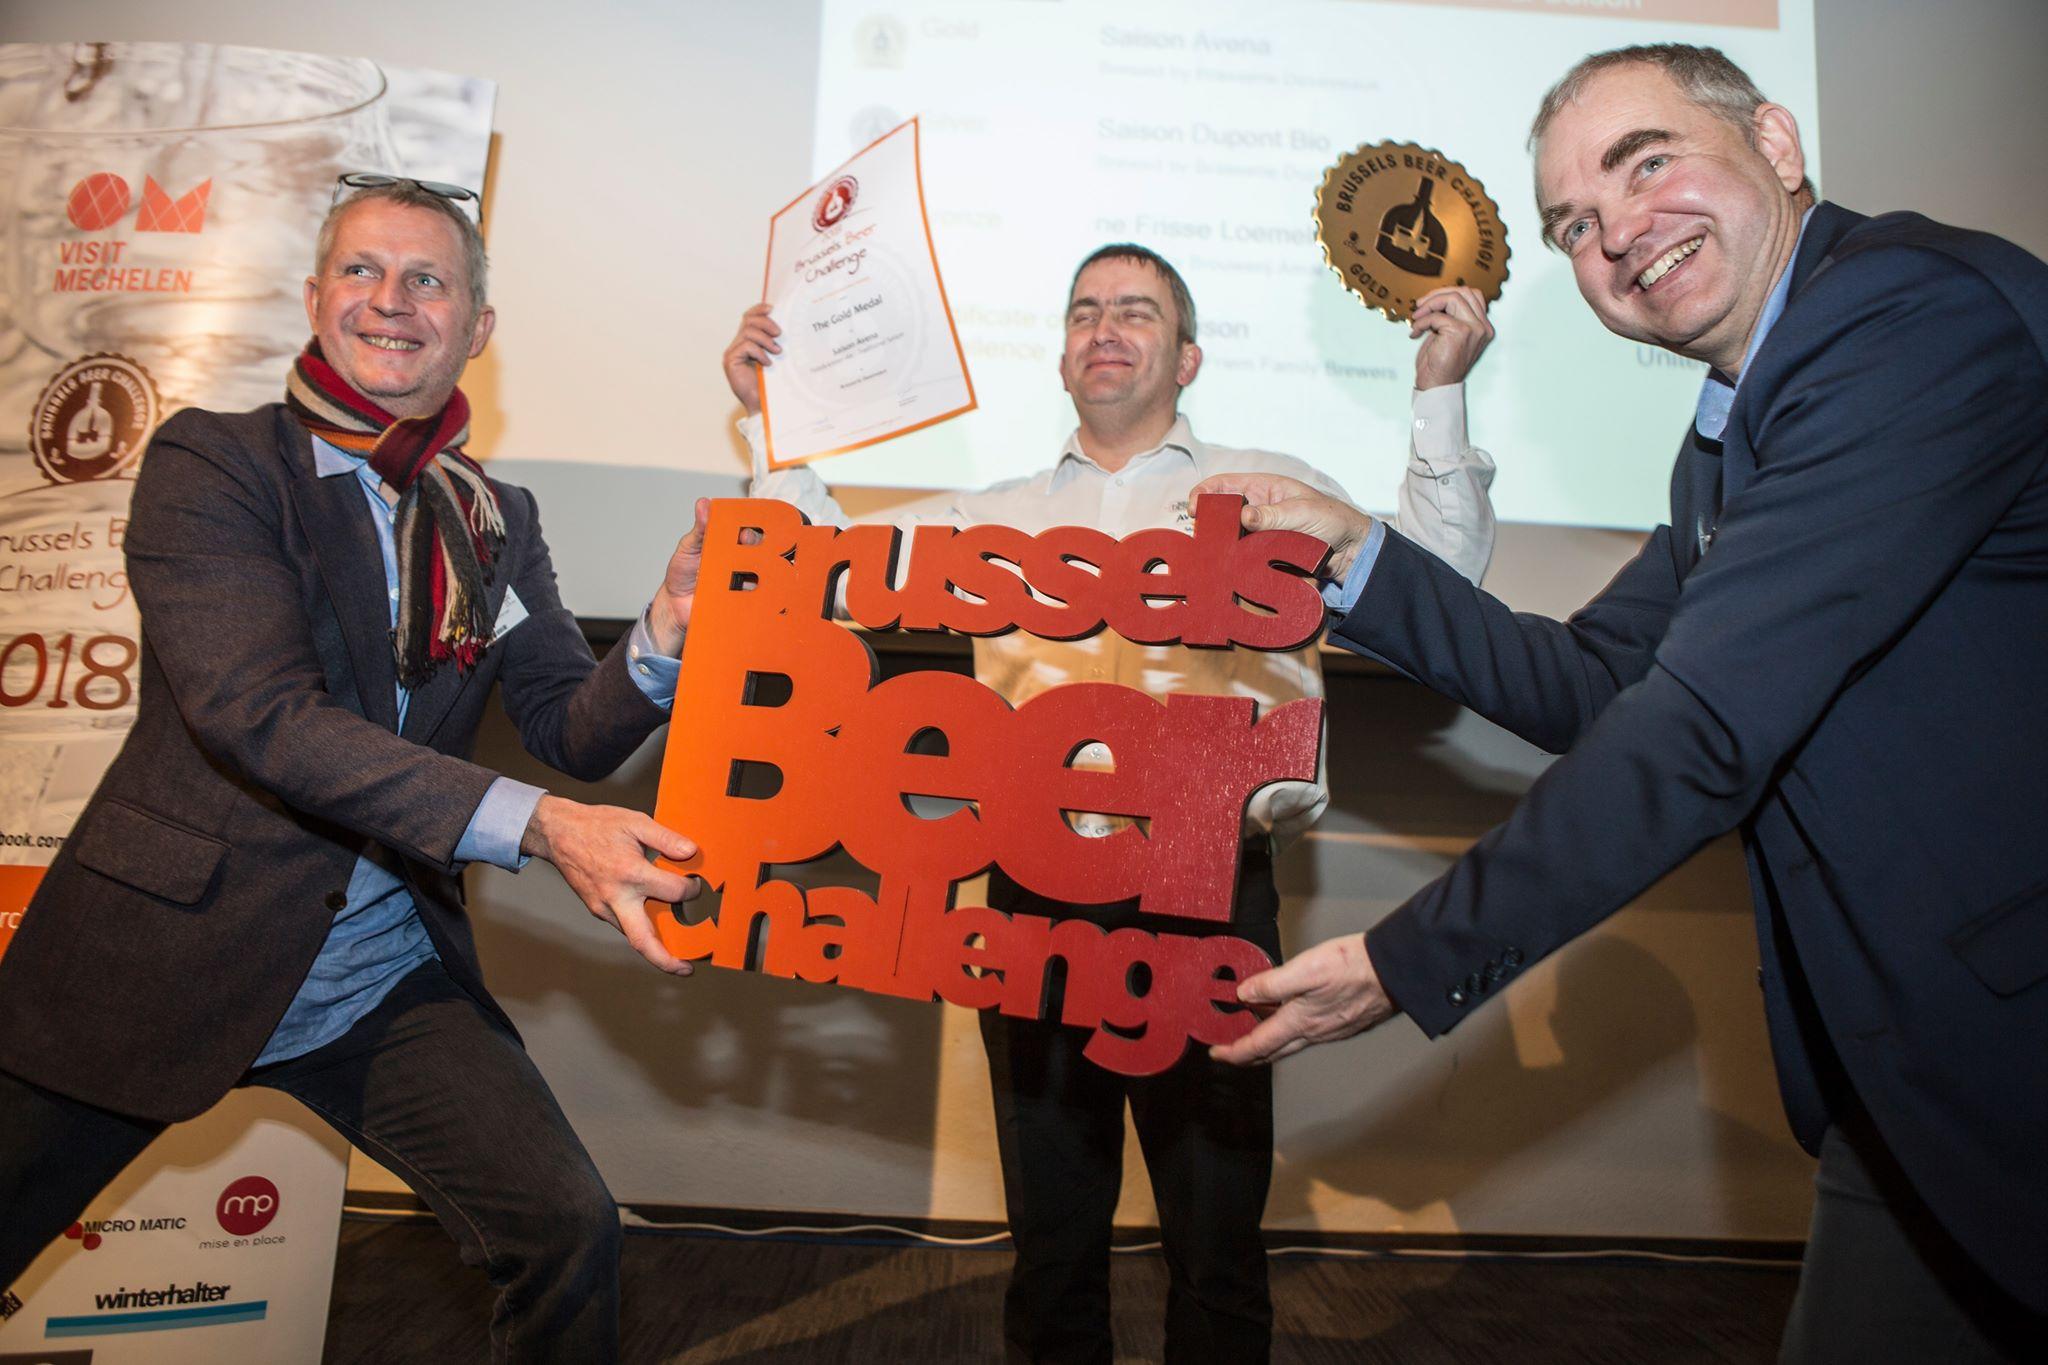 Brussels Beer Challenge 2019